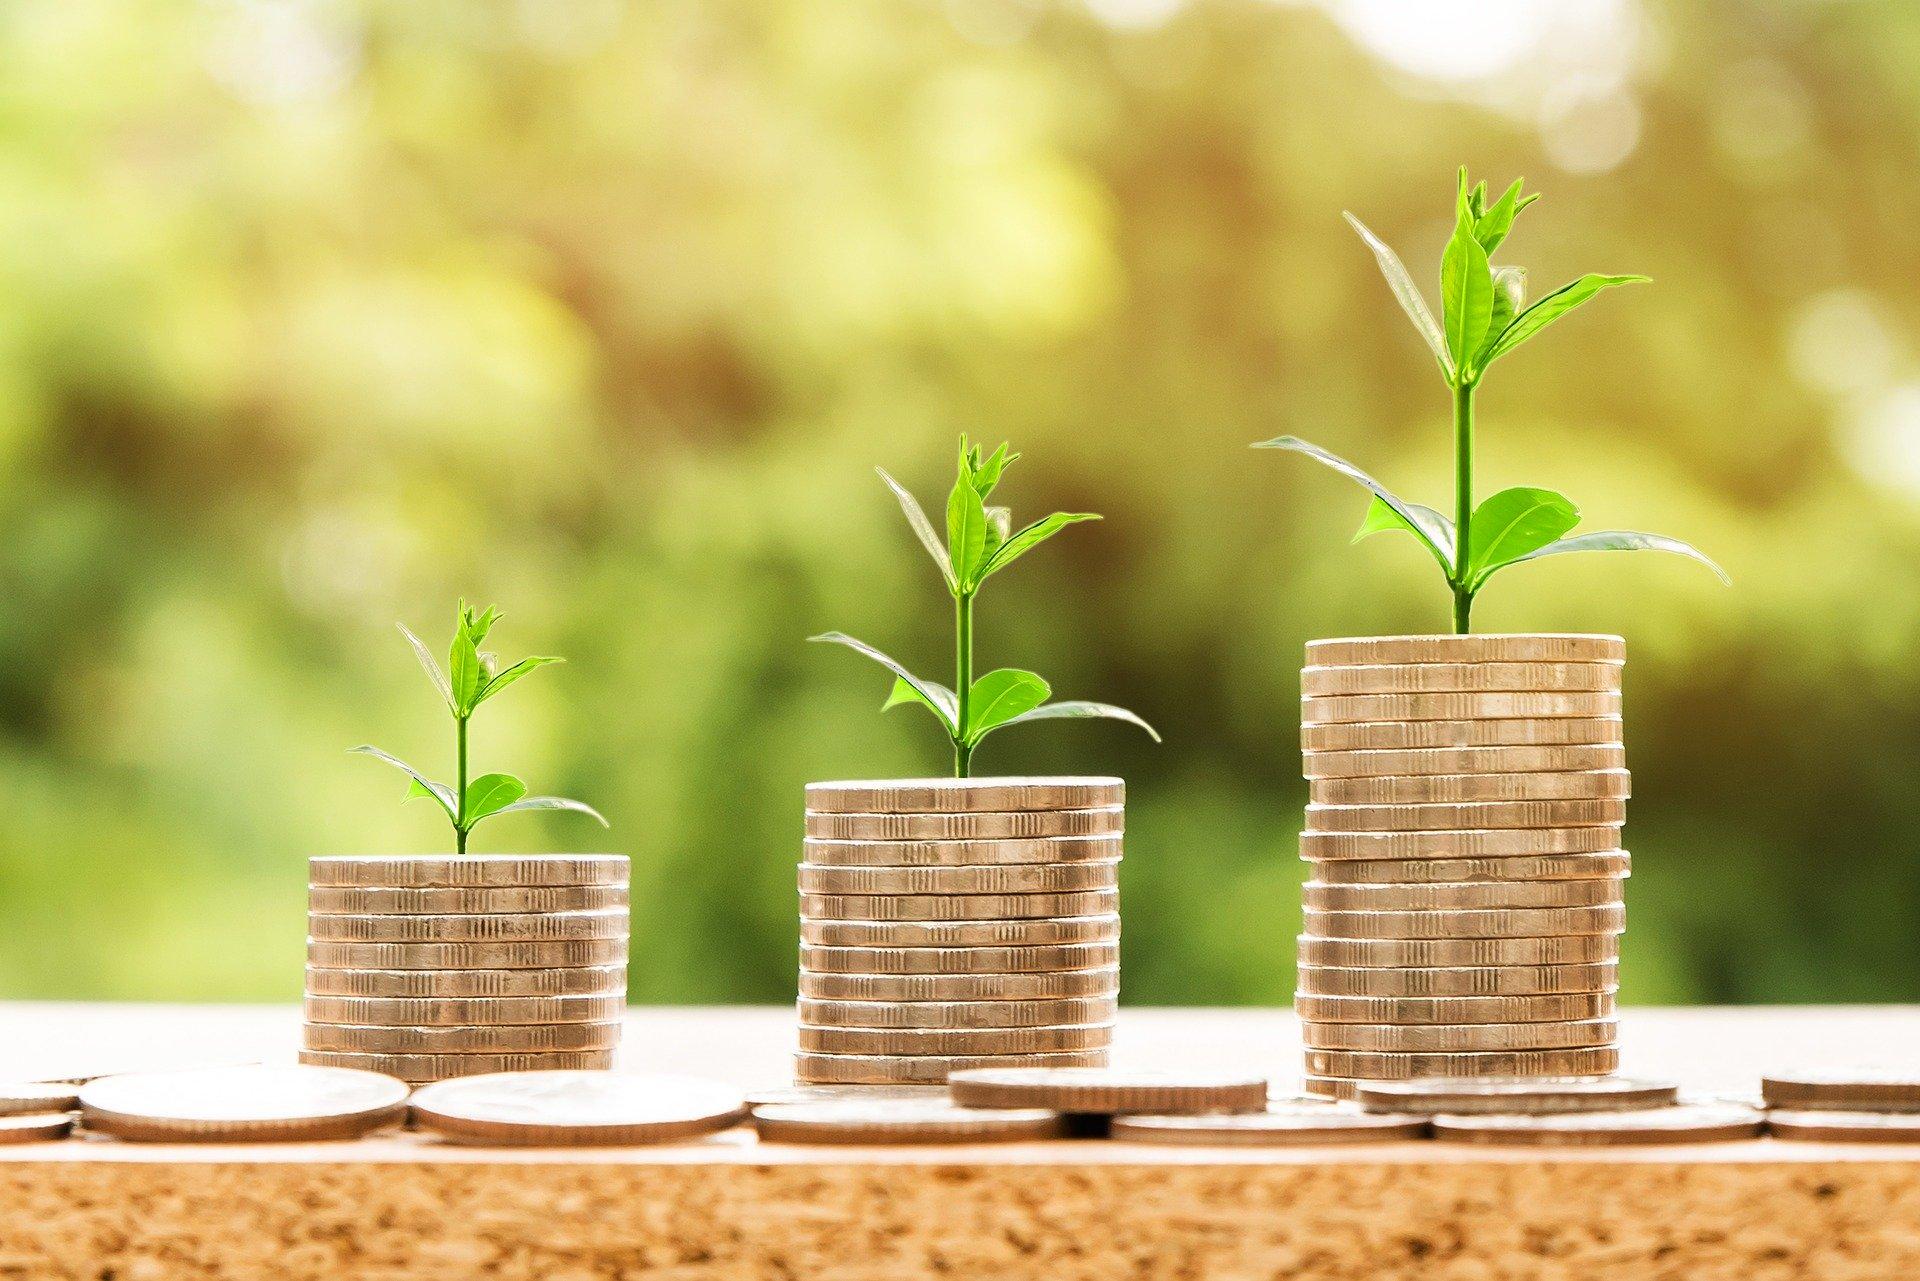 MACo Members: Last Chance to Register – FREE Webinar on Maximizing Taxpayer Dollars